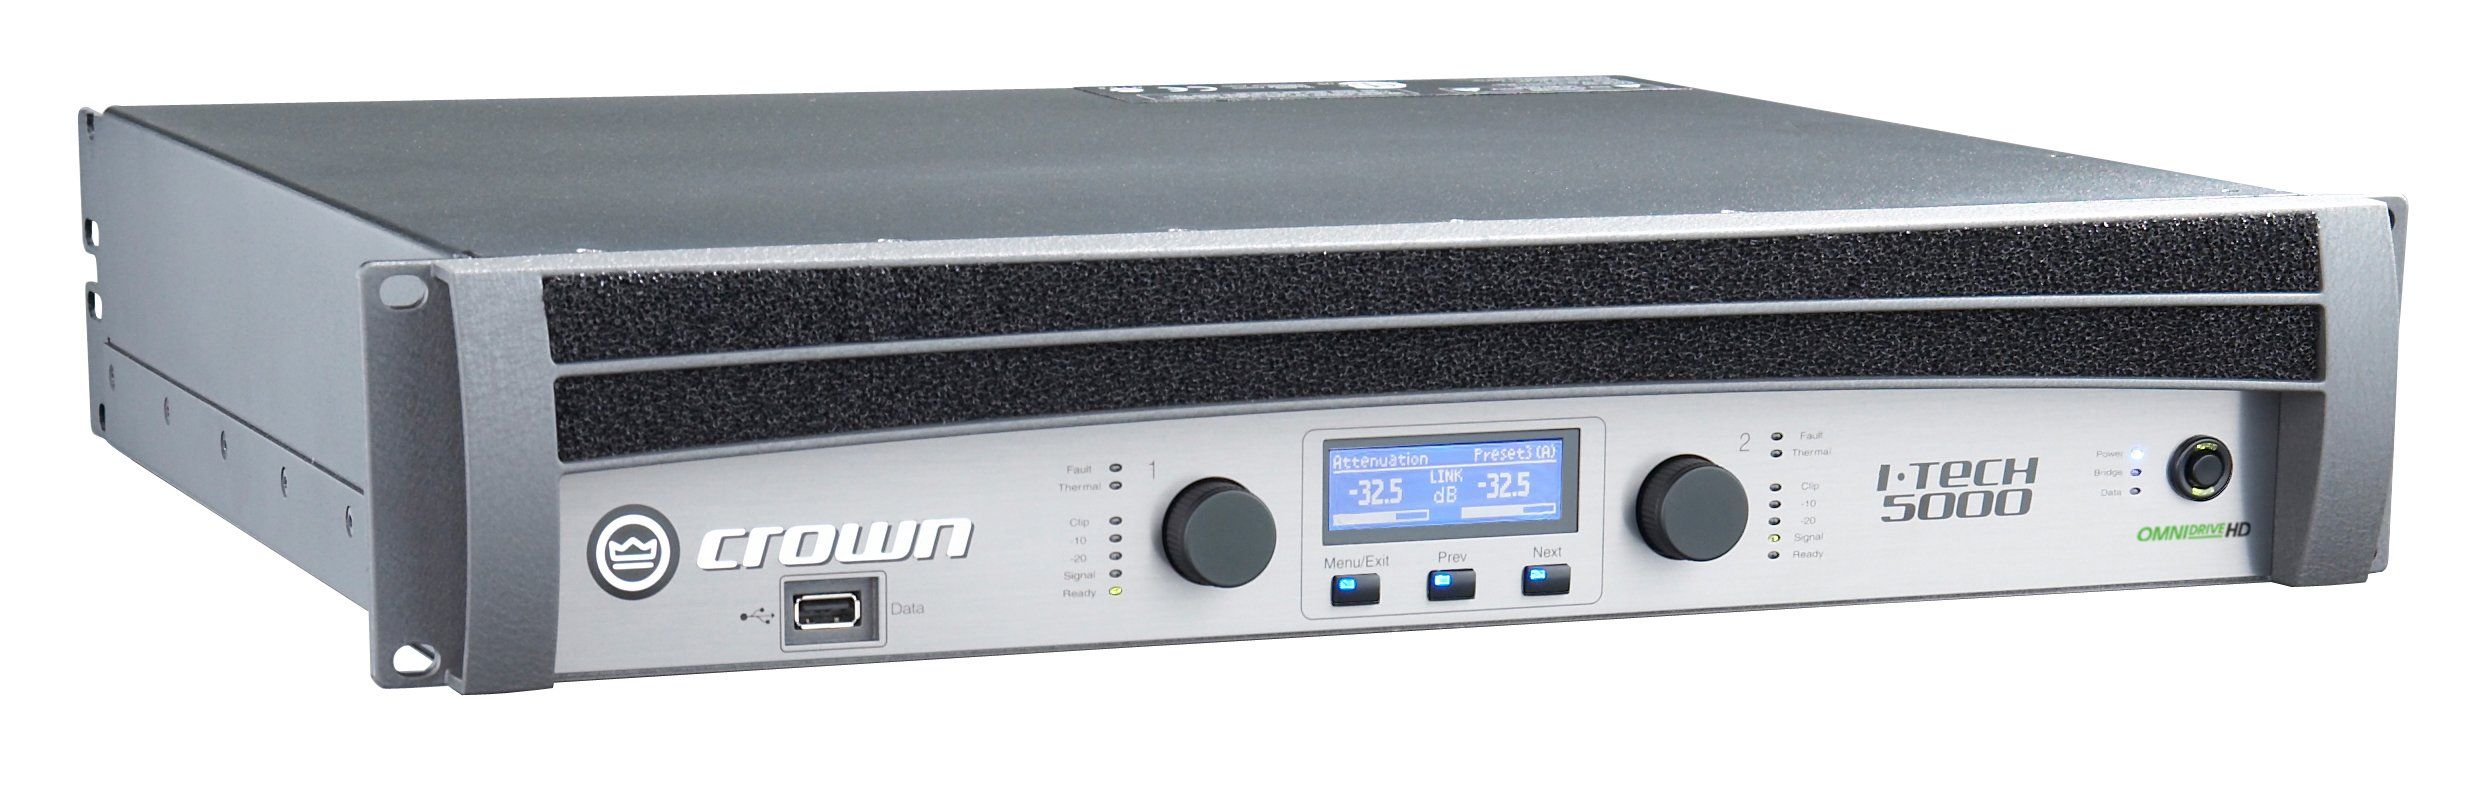 crown it5000hd power amplifier dj mix club amplifiers pinterest. Black Bedroom Furniture Sets. Home Design Ideas